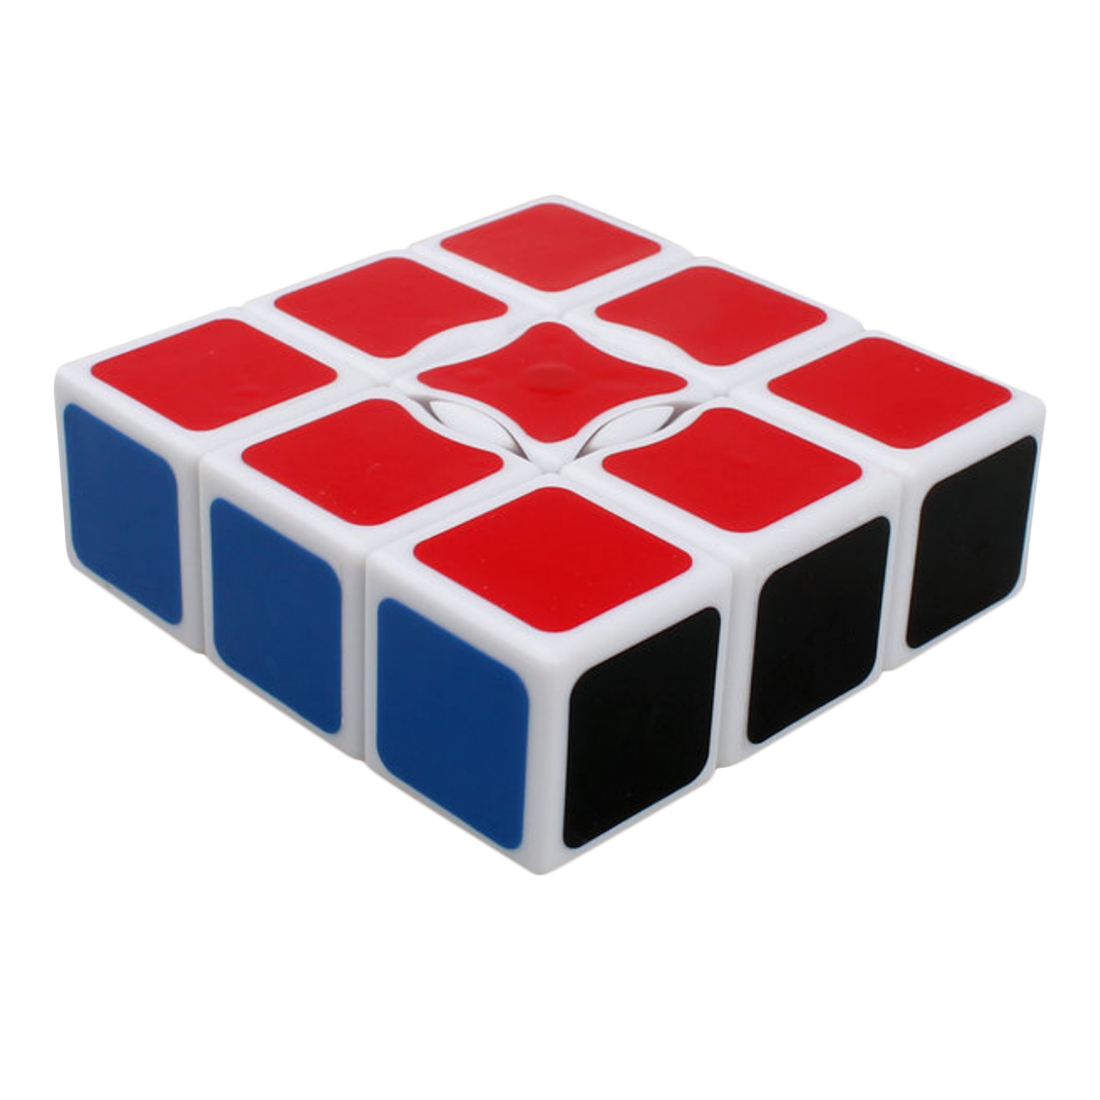 1X3X3 Floppy Magic Cube Puzzle Brain Teaser <br><br>Aliexpress